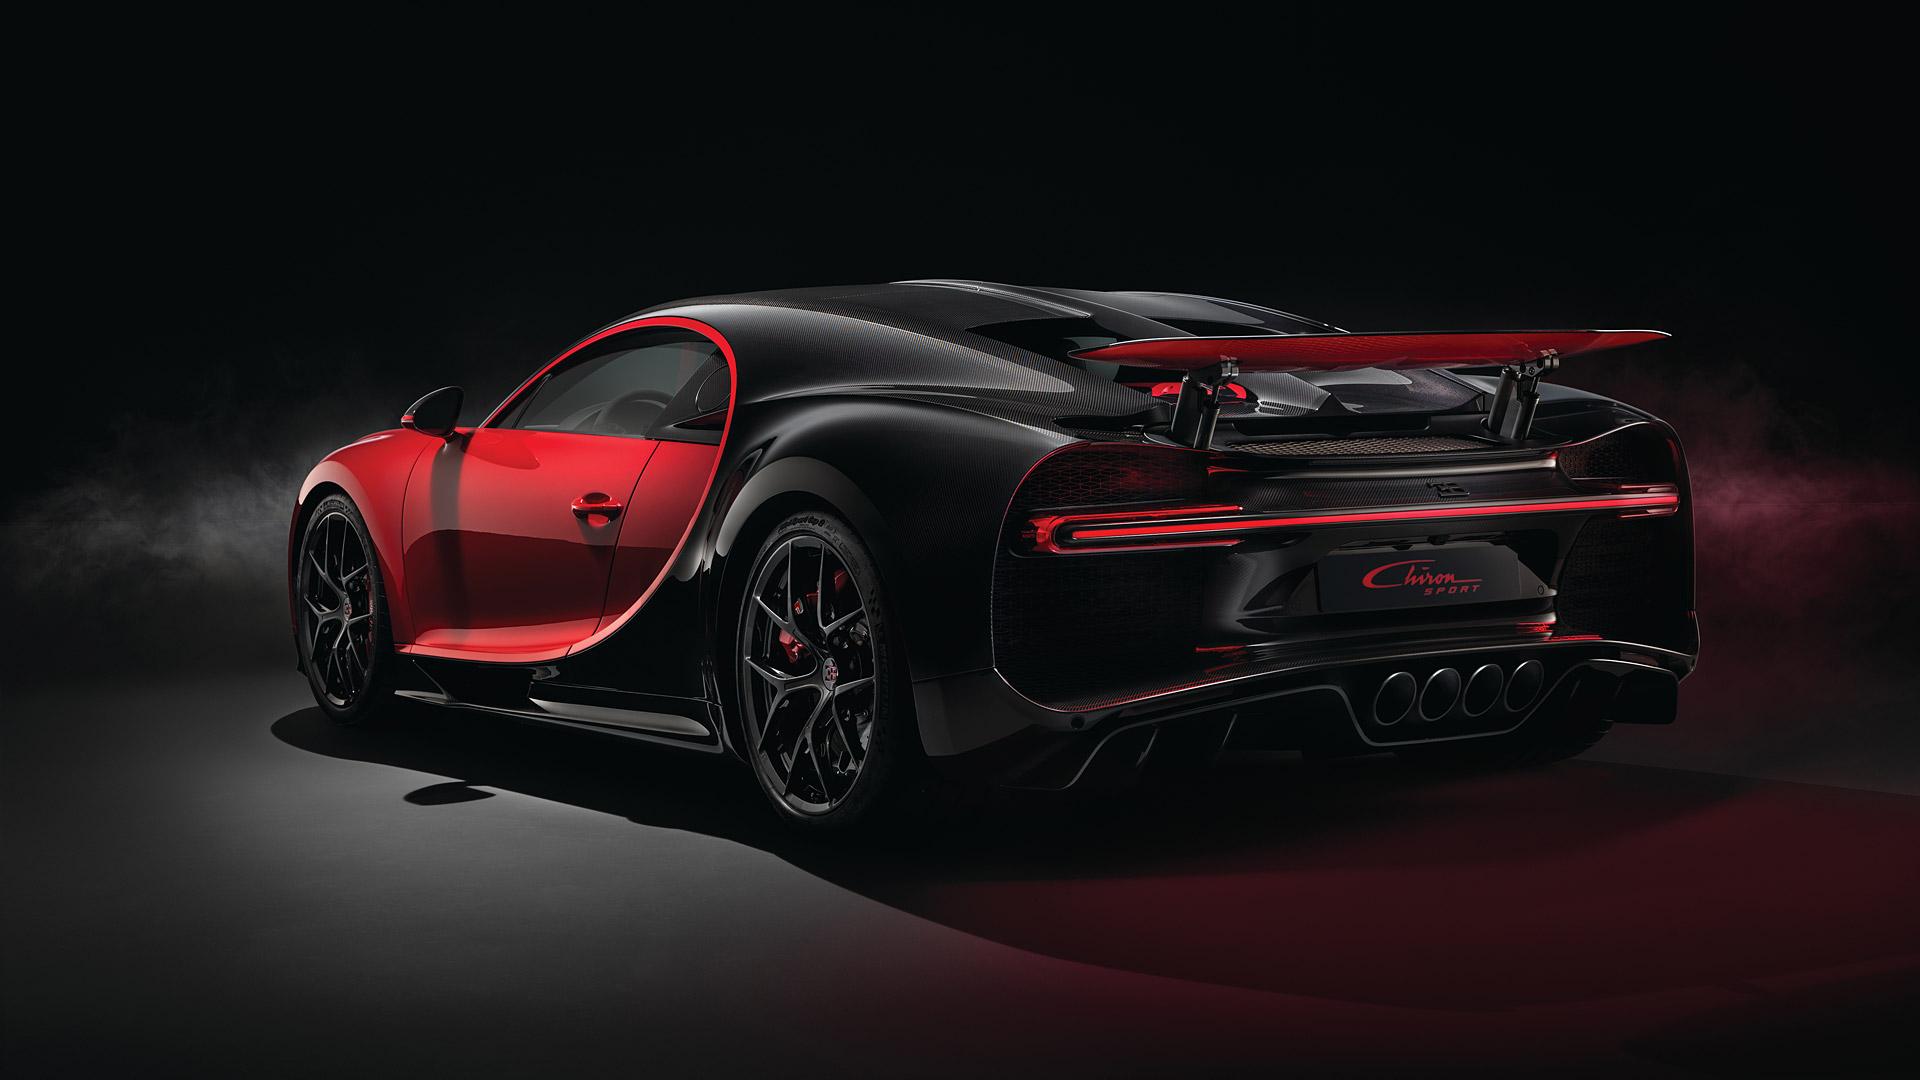 2019 Bugatti Chiron Sport HD Wallpaper